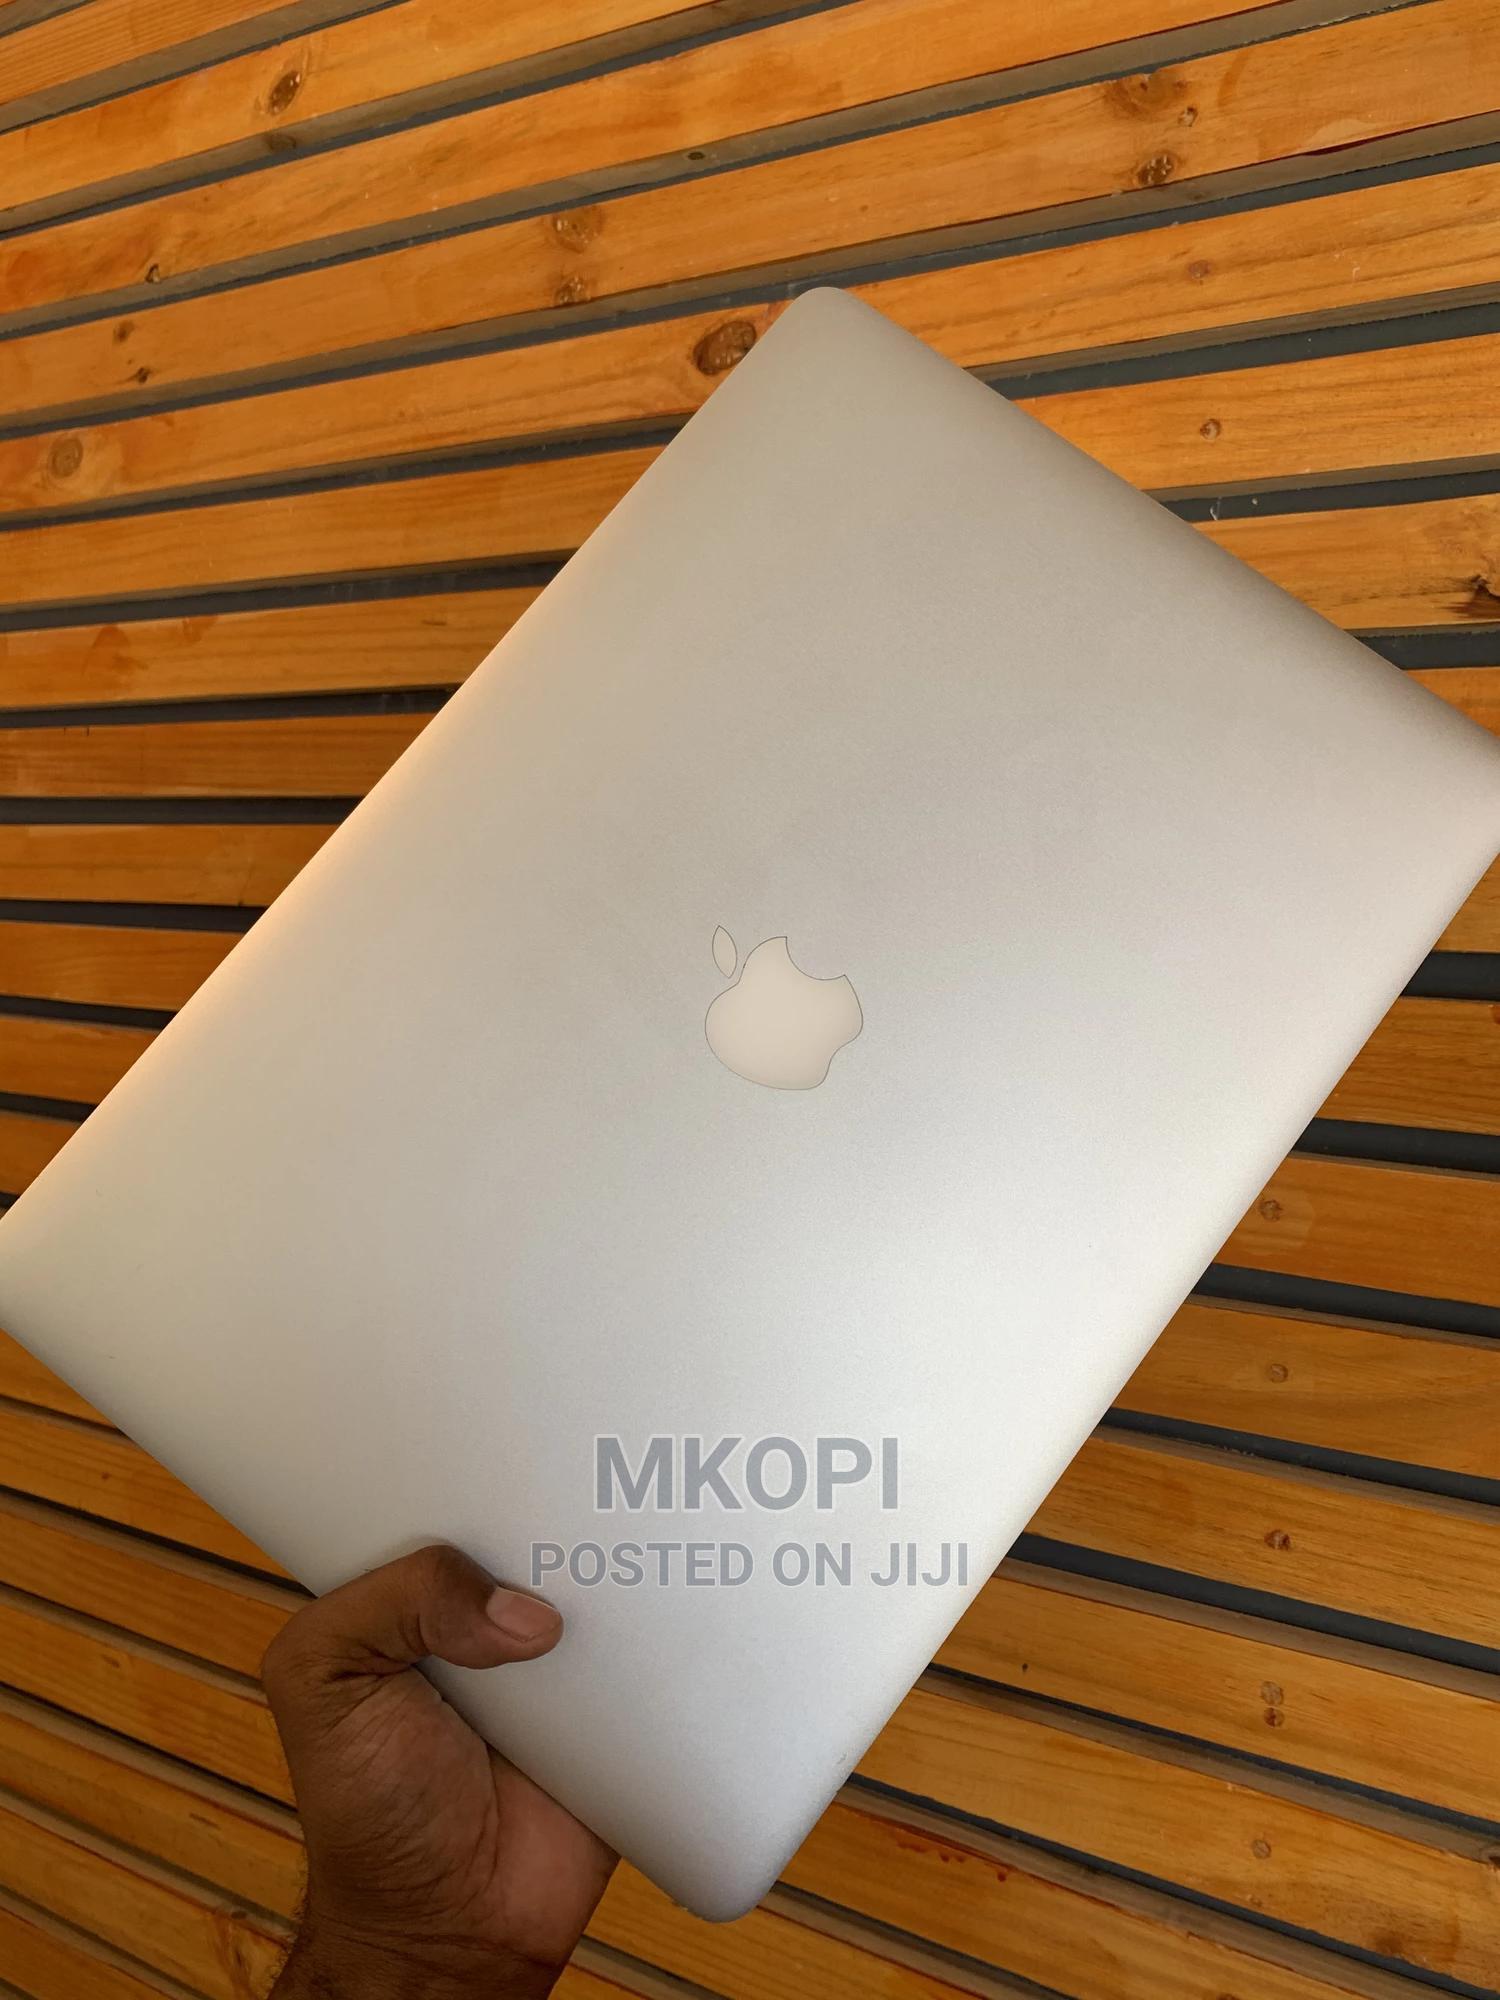 Laptop Apple MacBook Pro 2013 8GB Intel Core I5 SSD 256GB | Laptops & Computers for sale in Kinondoni, Dar es Salaam, Tanzania